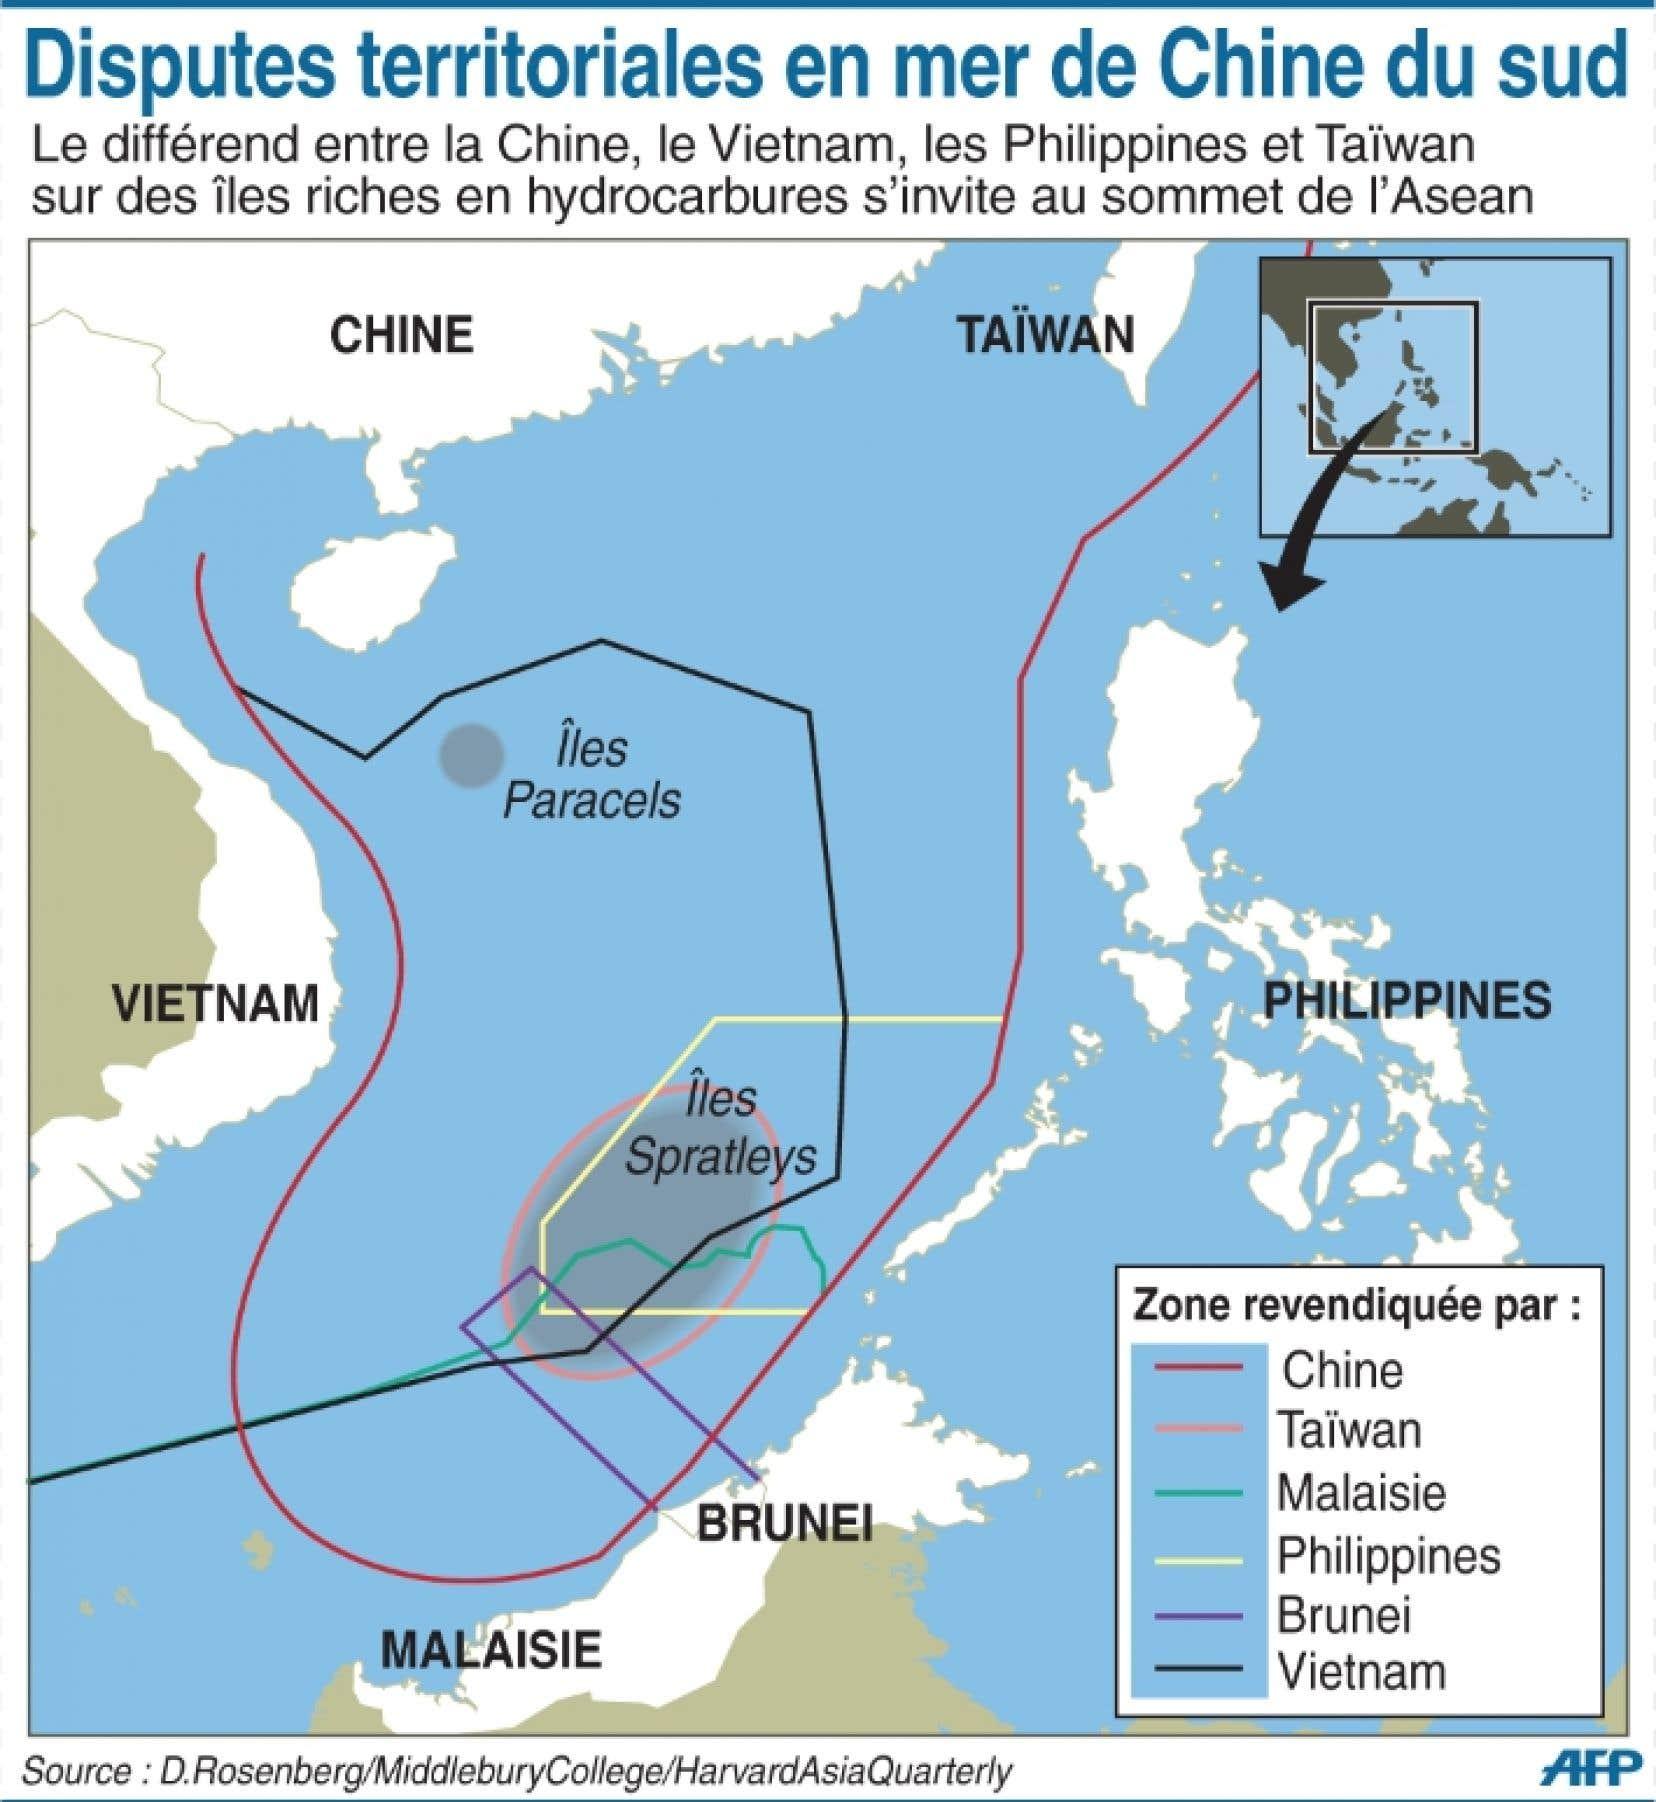 Disputes territoriales en mer de Chine du sud